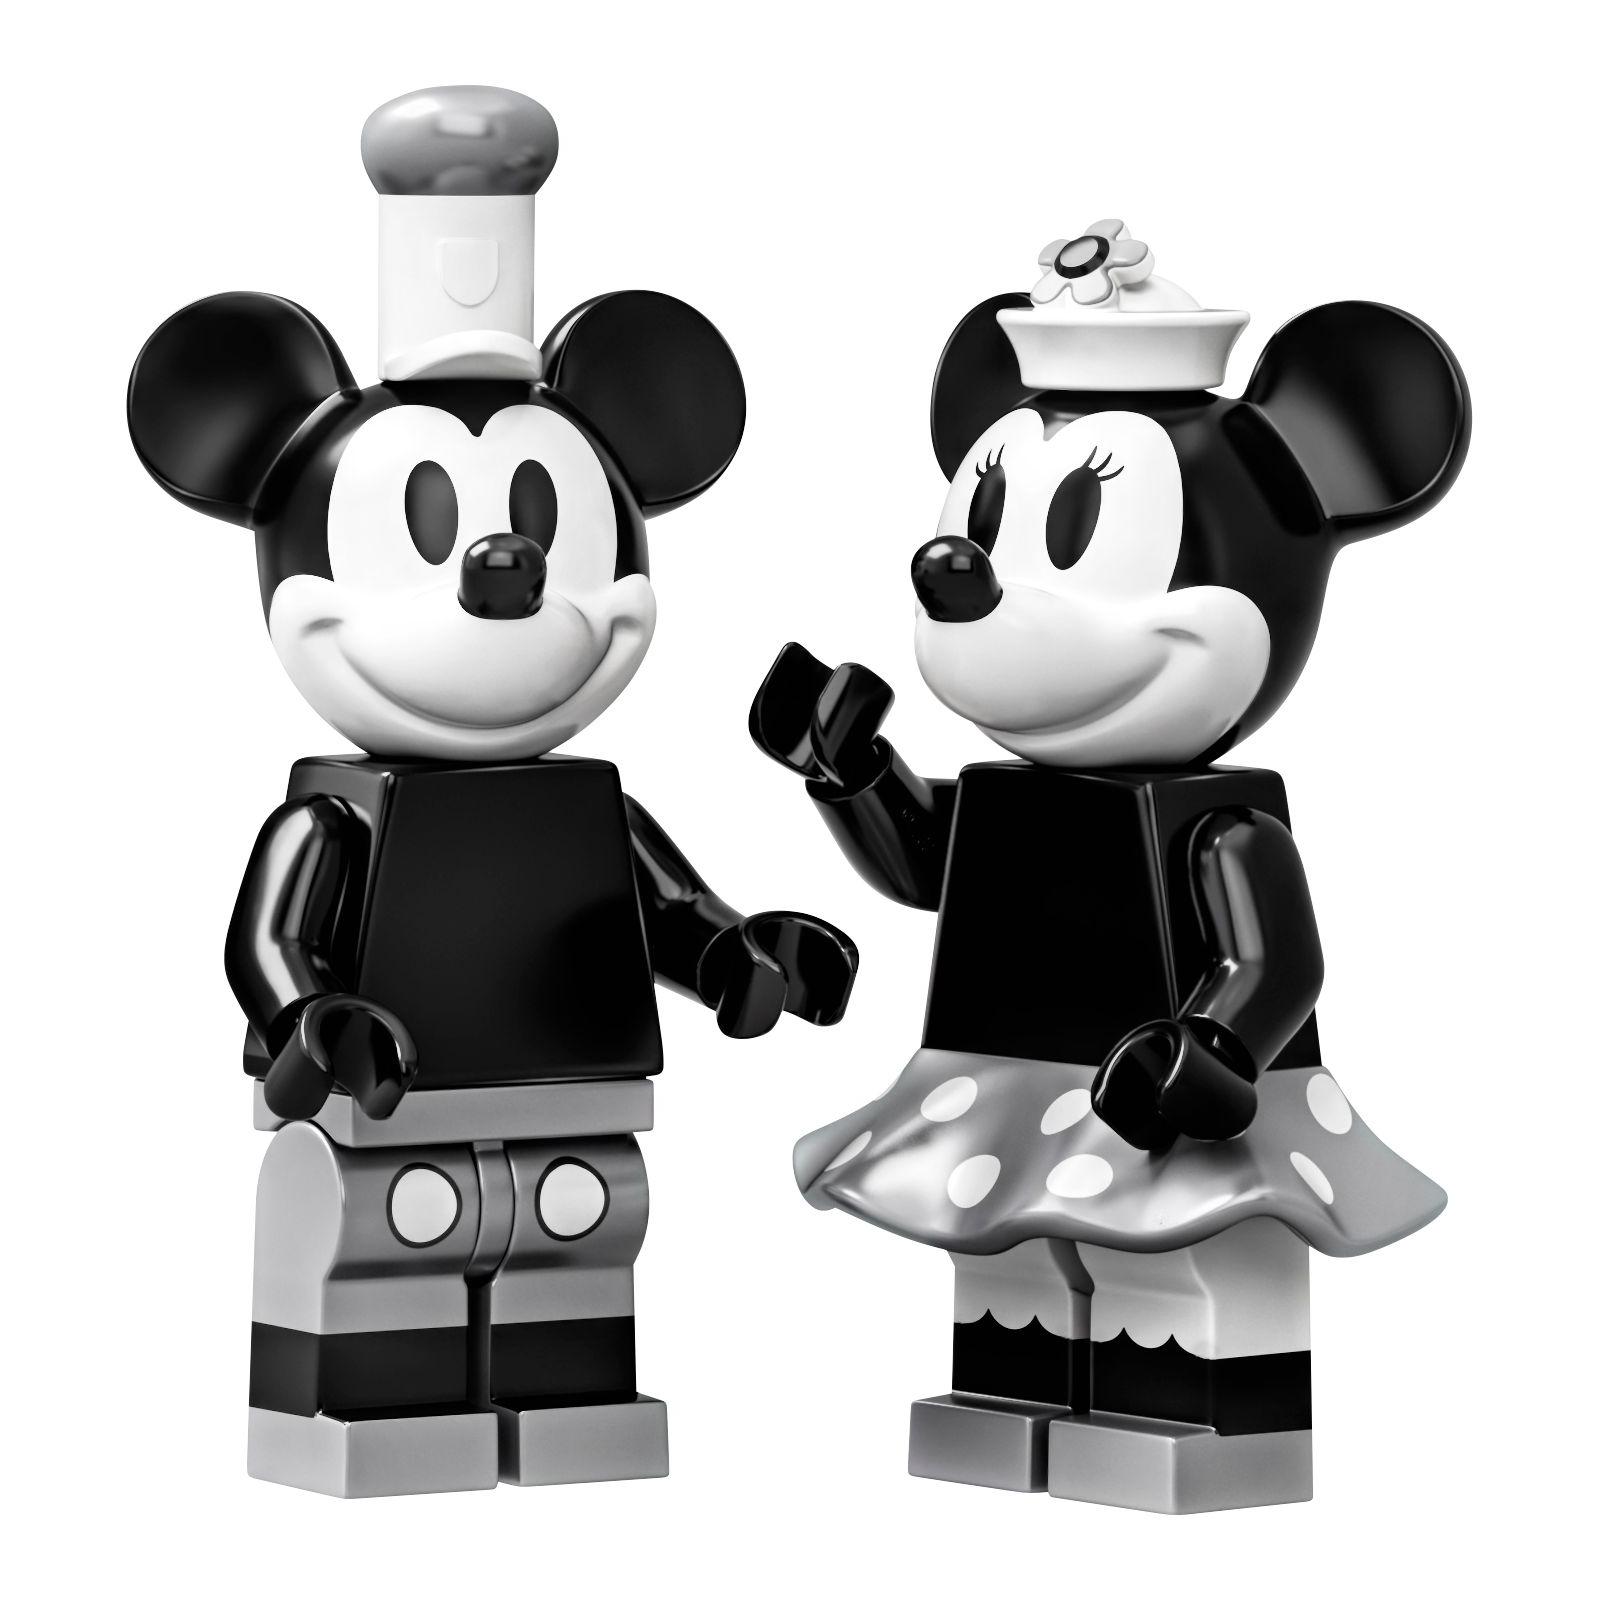 LEGO Ideas Disney Steamboat Willie #21317